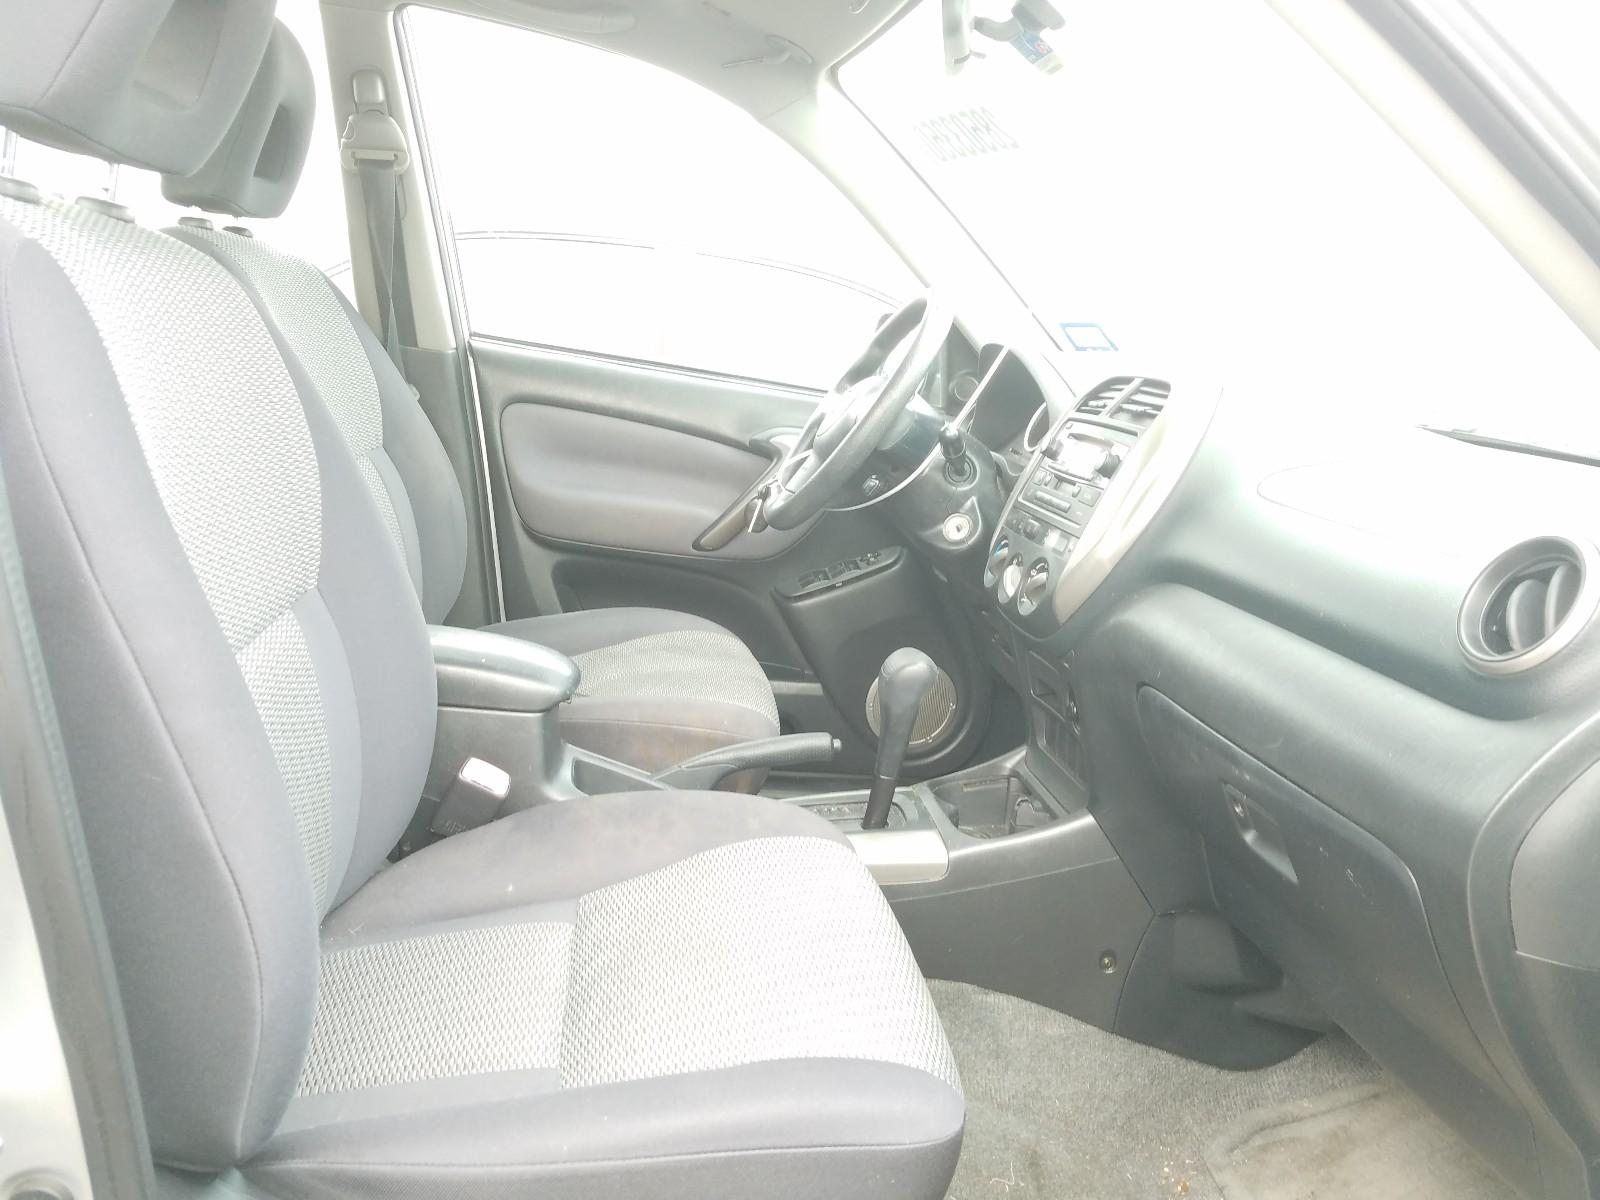 JTEGD20V740042385 - 2004 Toyota Rav4 2.4L close up View